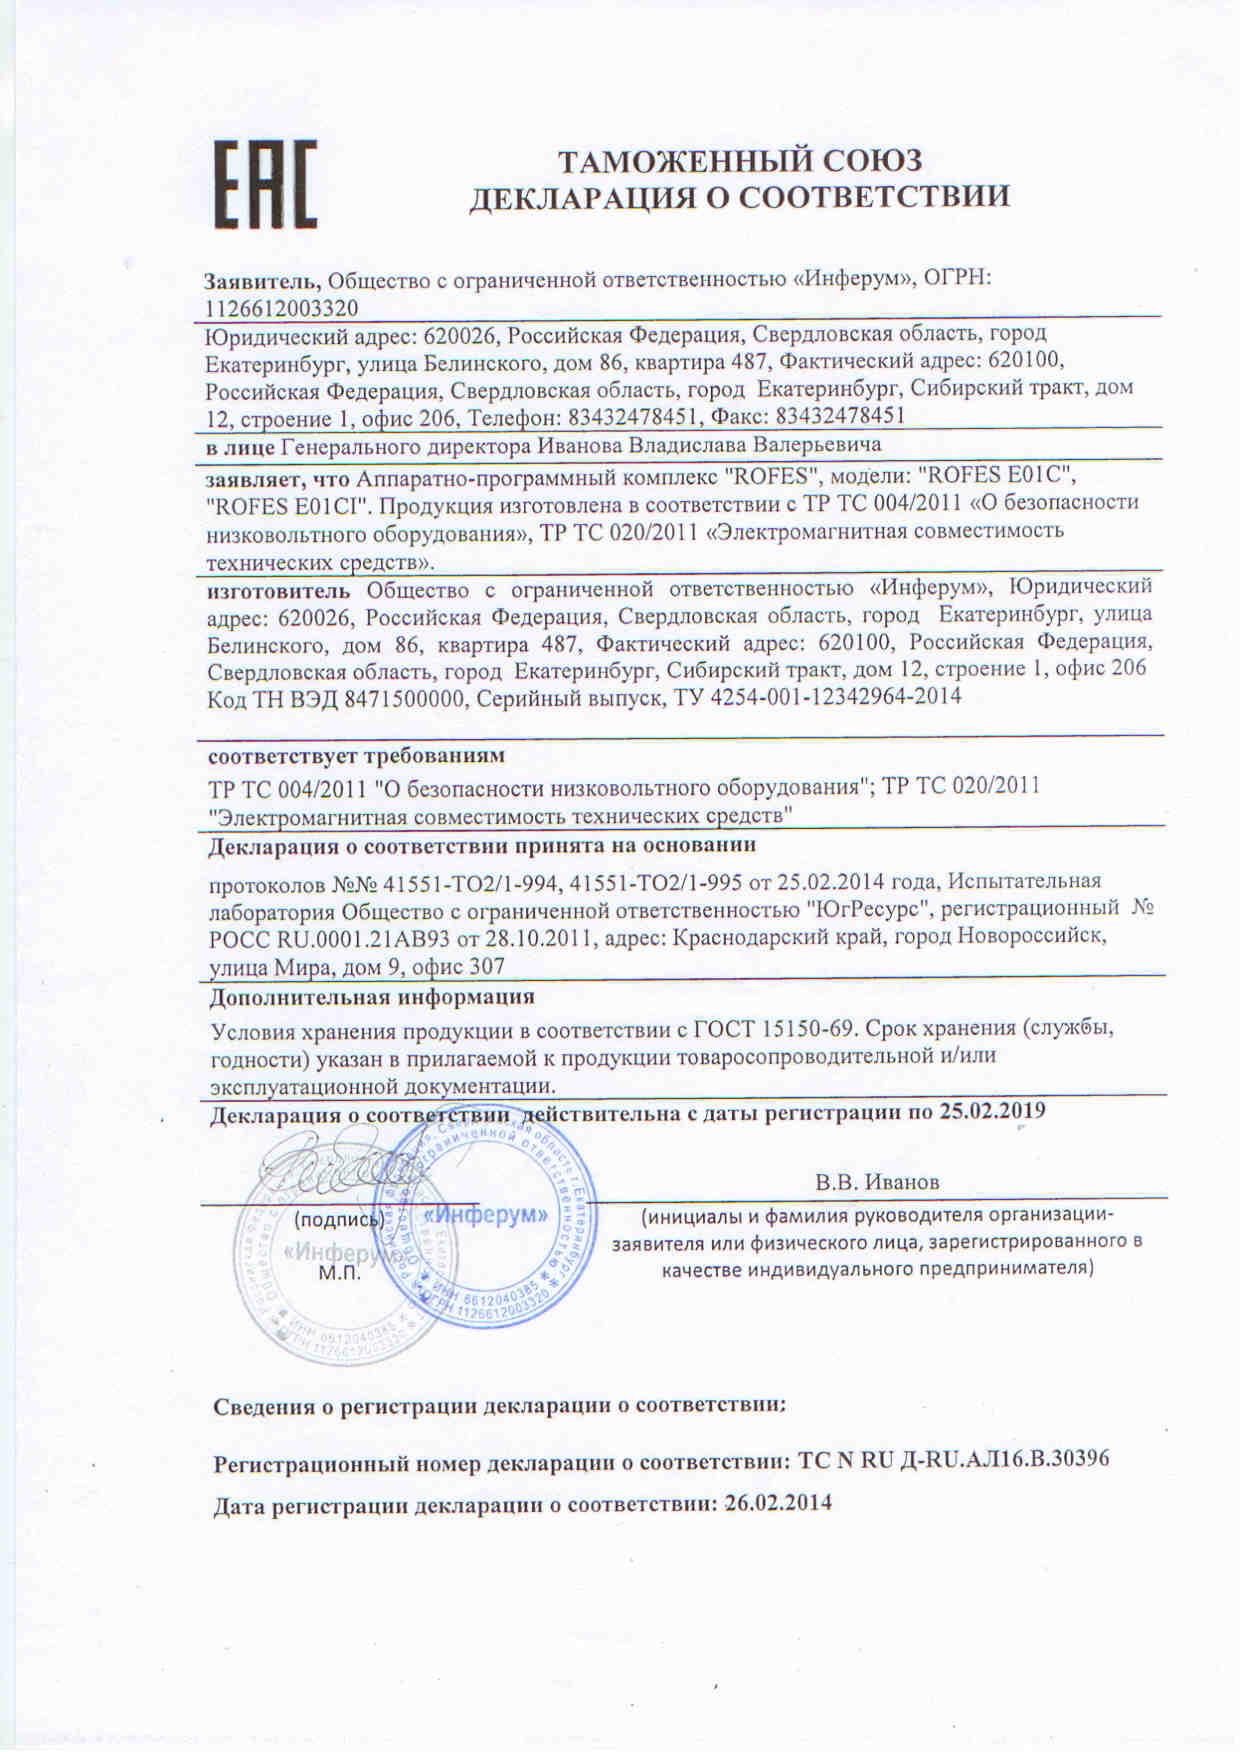 Сертификат на Рофес